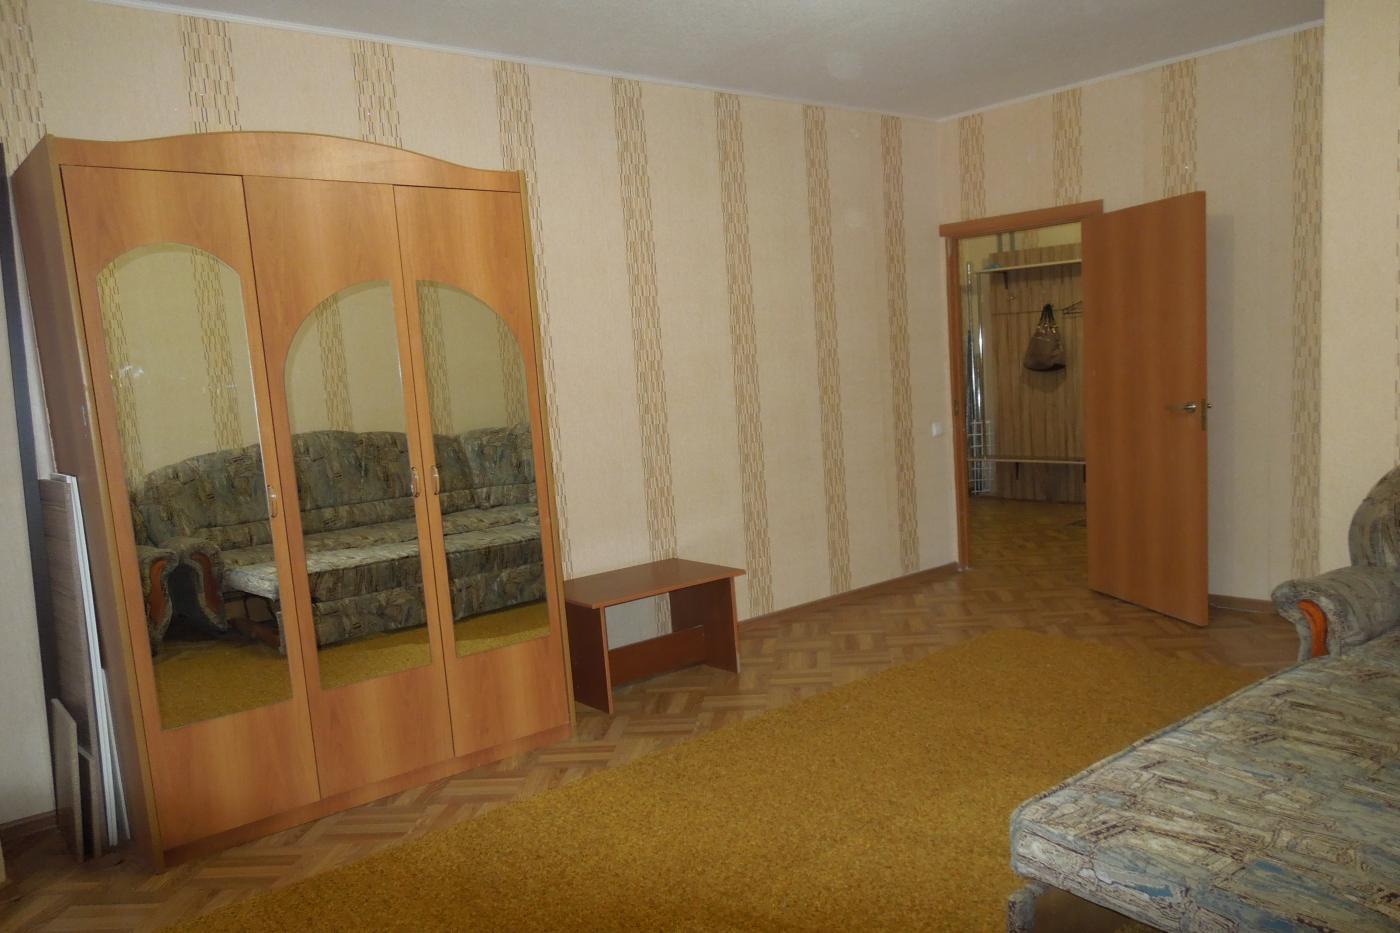 1-комнатная квартира посуточно (вариант № 1933), ул. Краснознаменная улица, фото № 3